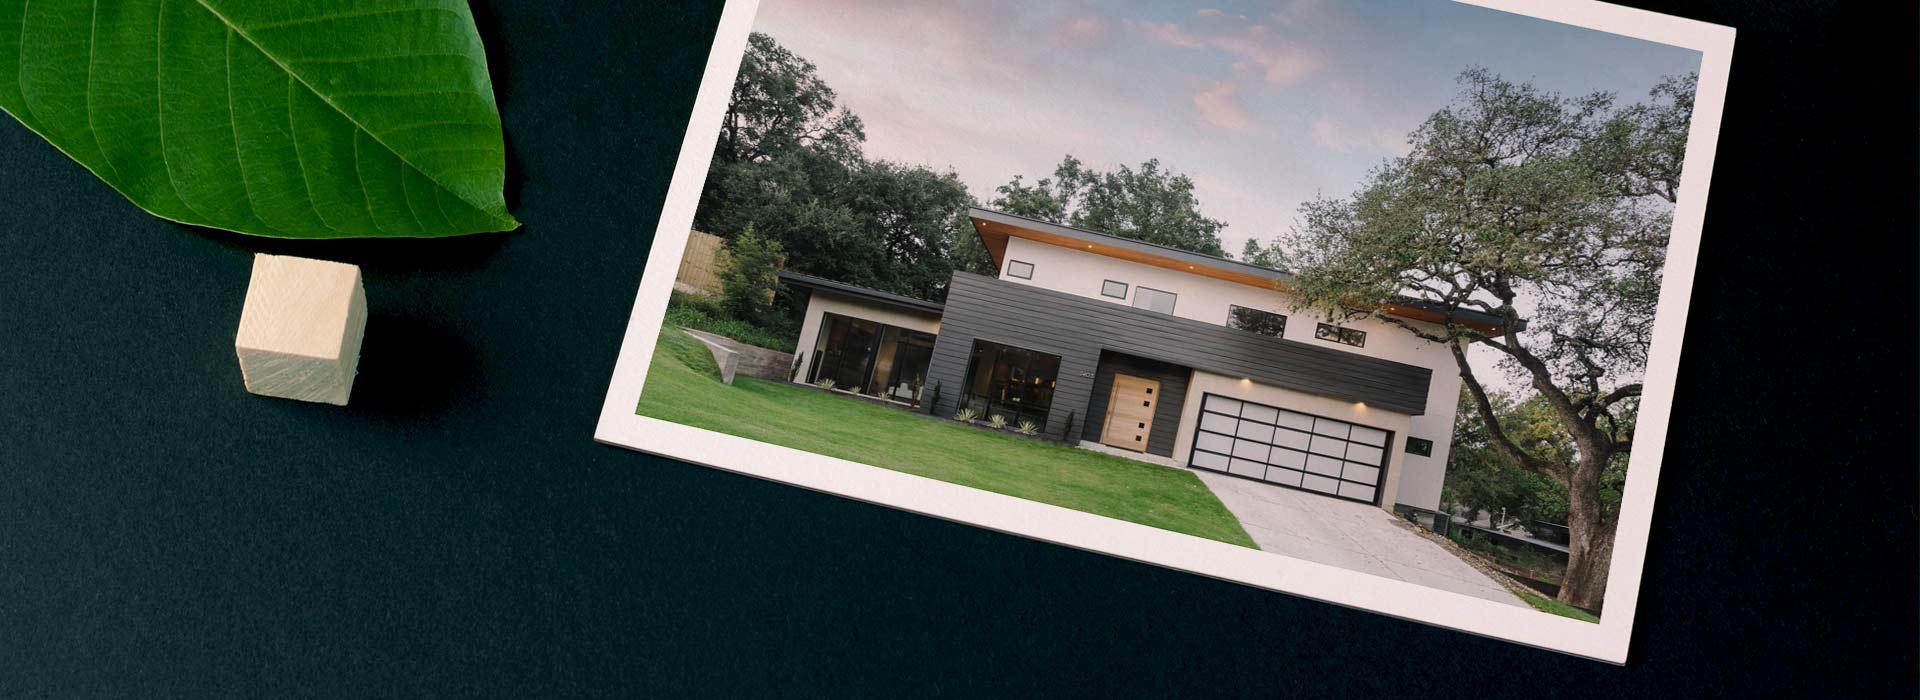 modern style - چه سبک معماری برای شما مناسب است ؟